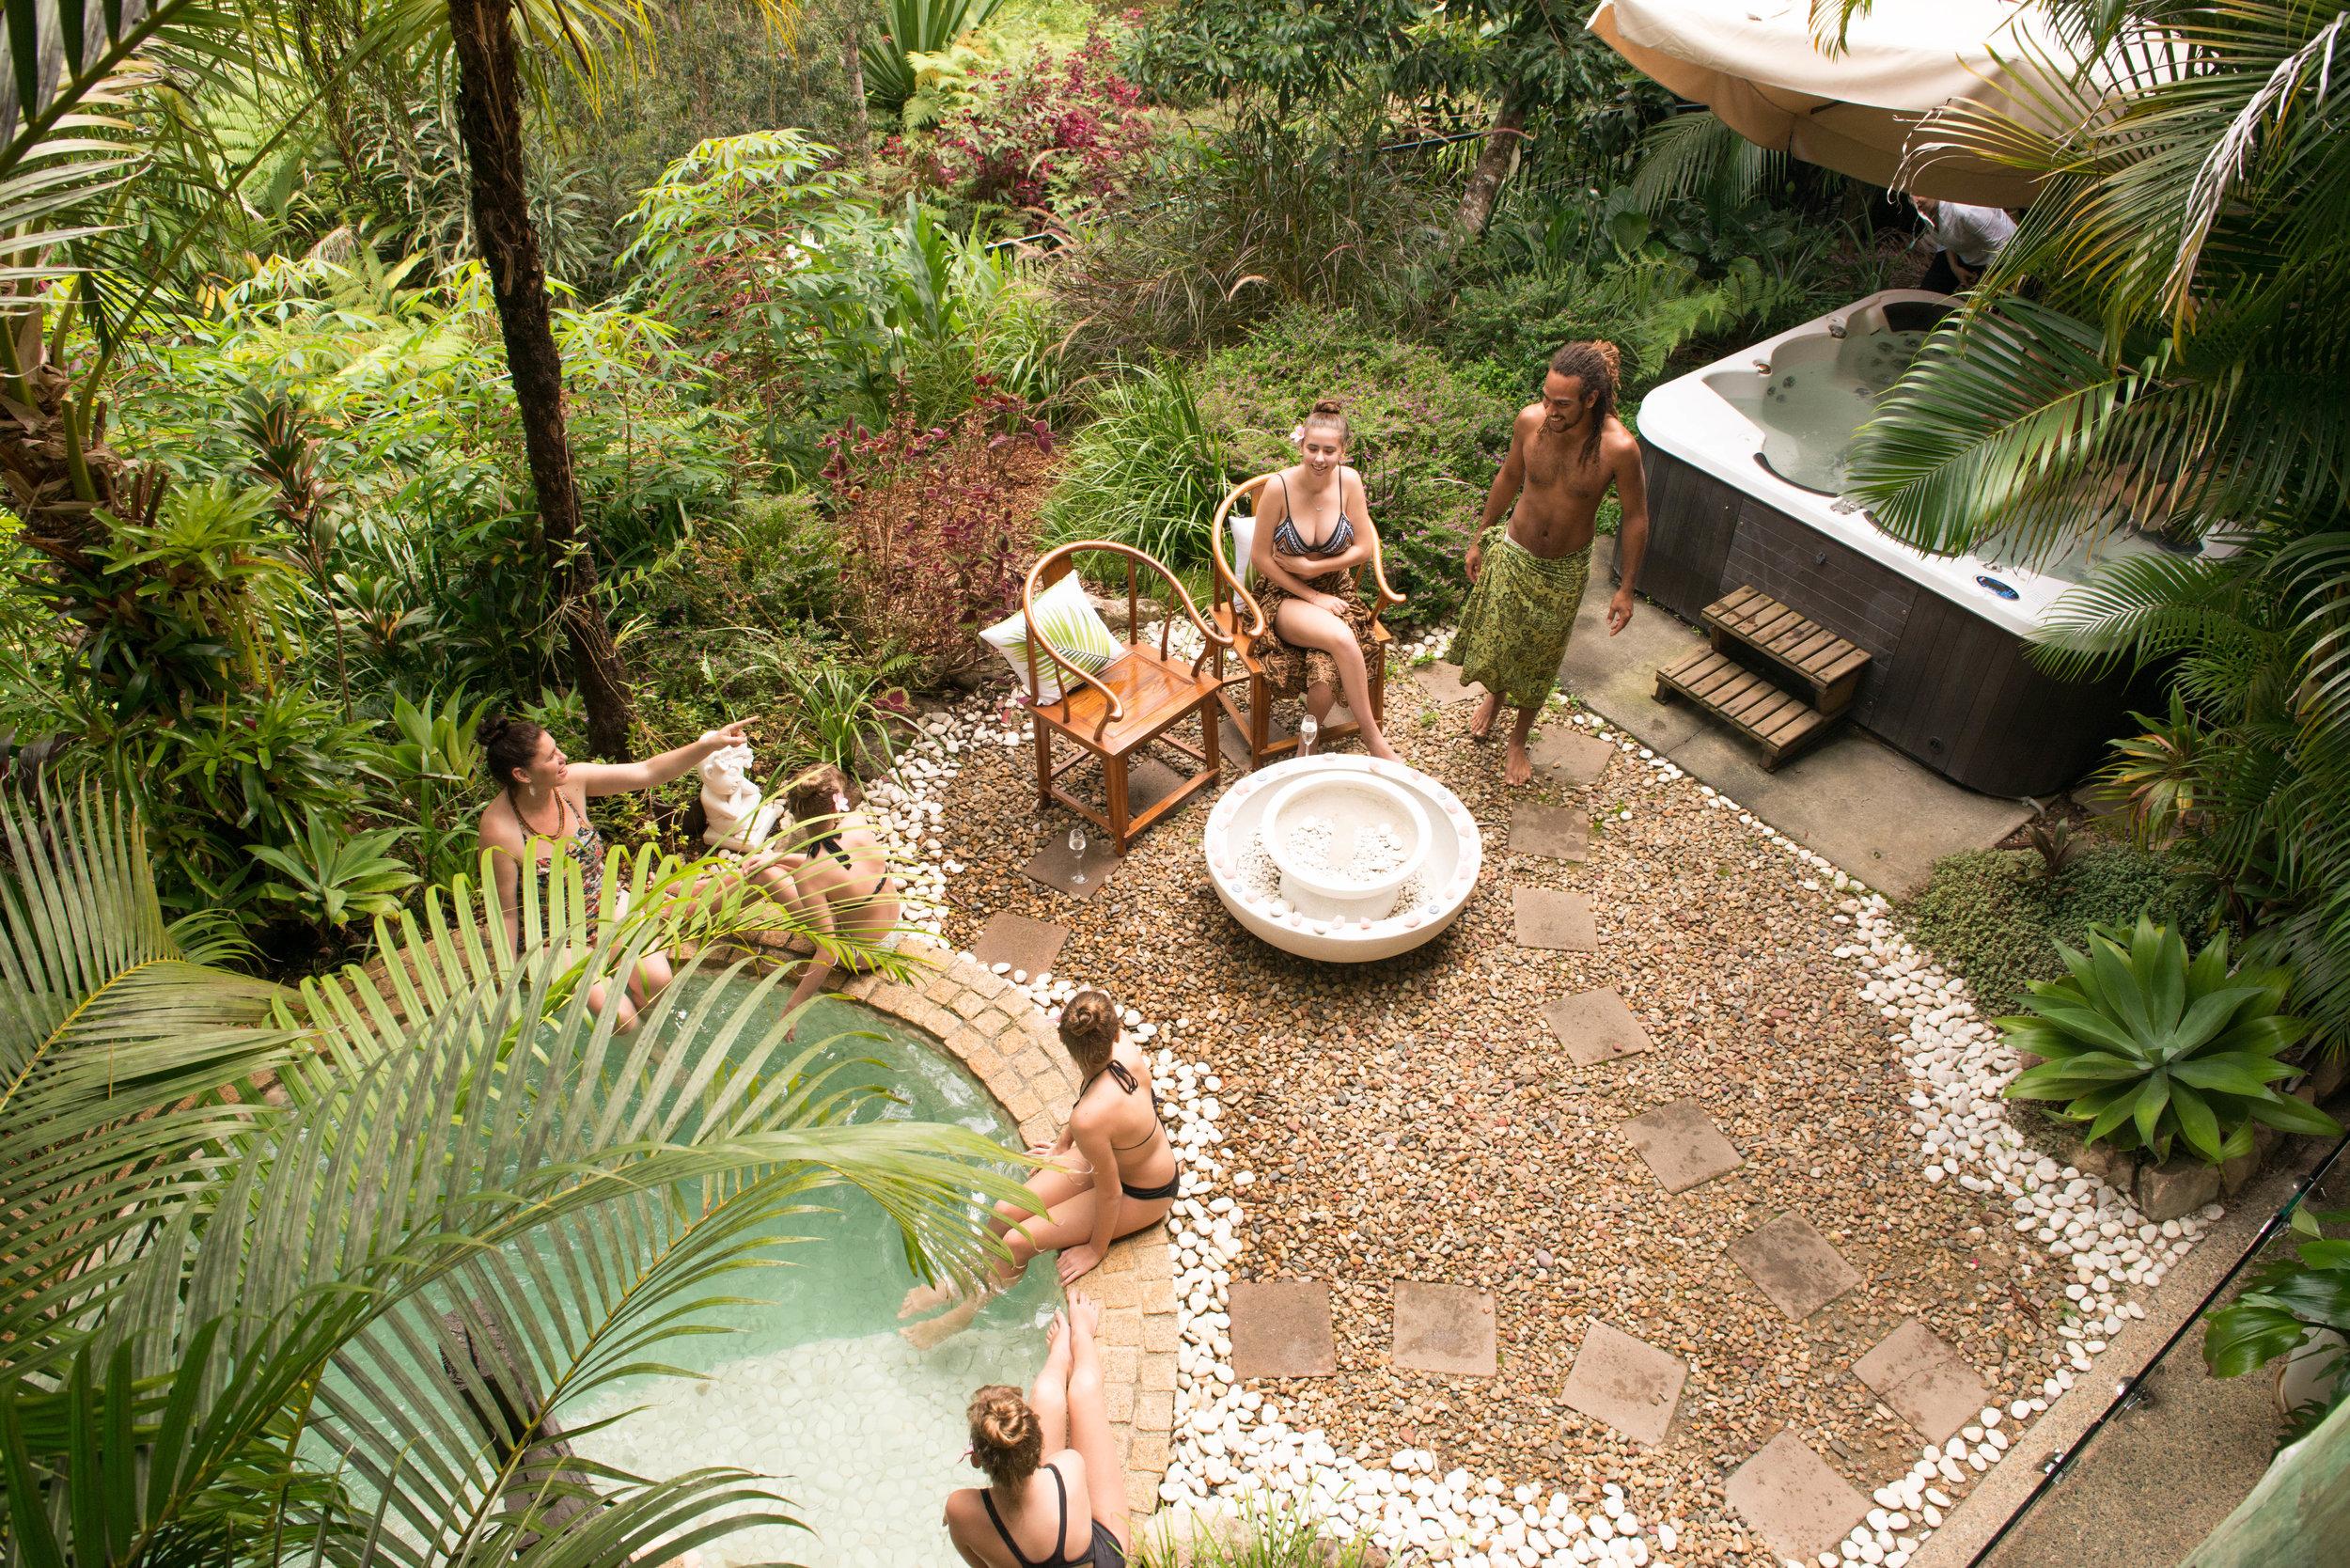 DSC_4983 Gymea Healing Spa, enjoying Plunge Pool & Spa.jpg